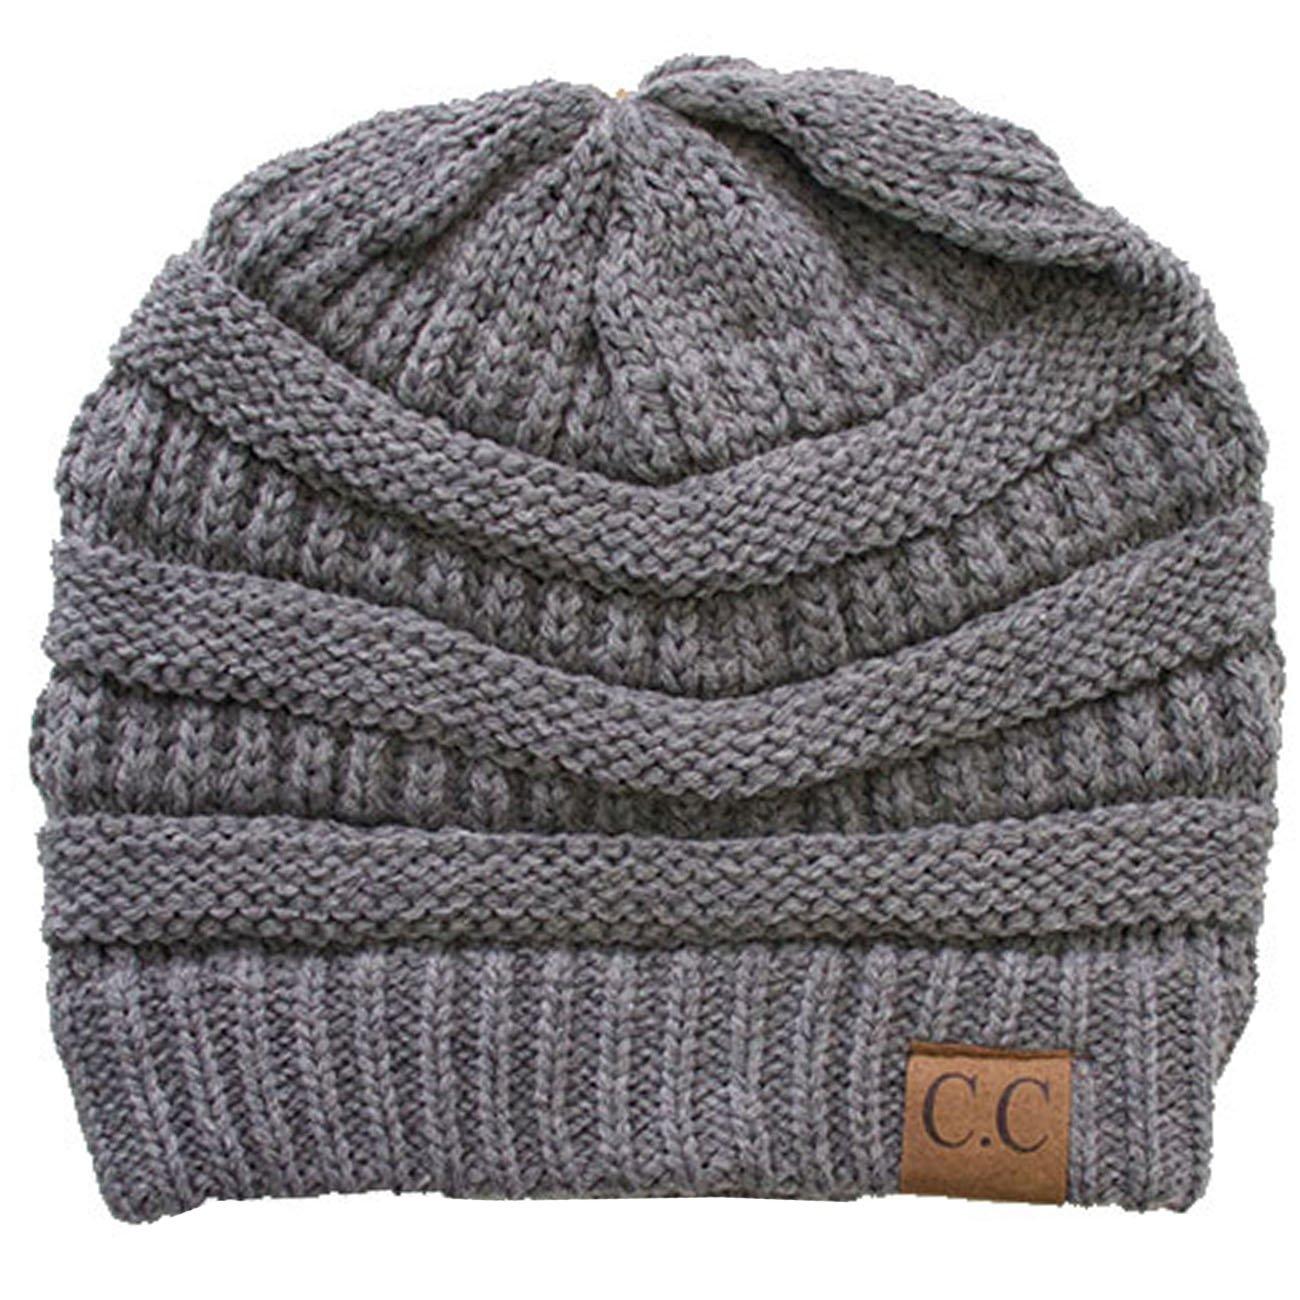 ScarvesMe CC Knit Fleece Fuzzy Lining Interior Thick Warm Beanie Skull Hat (Light Gray)